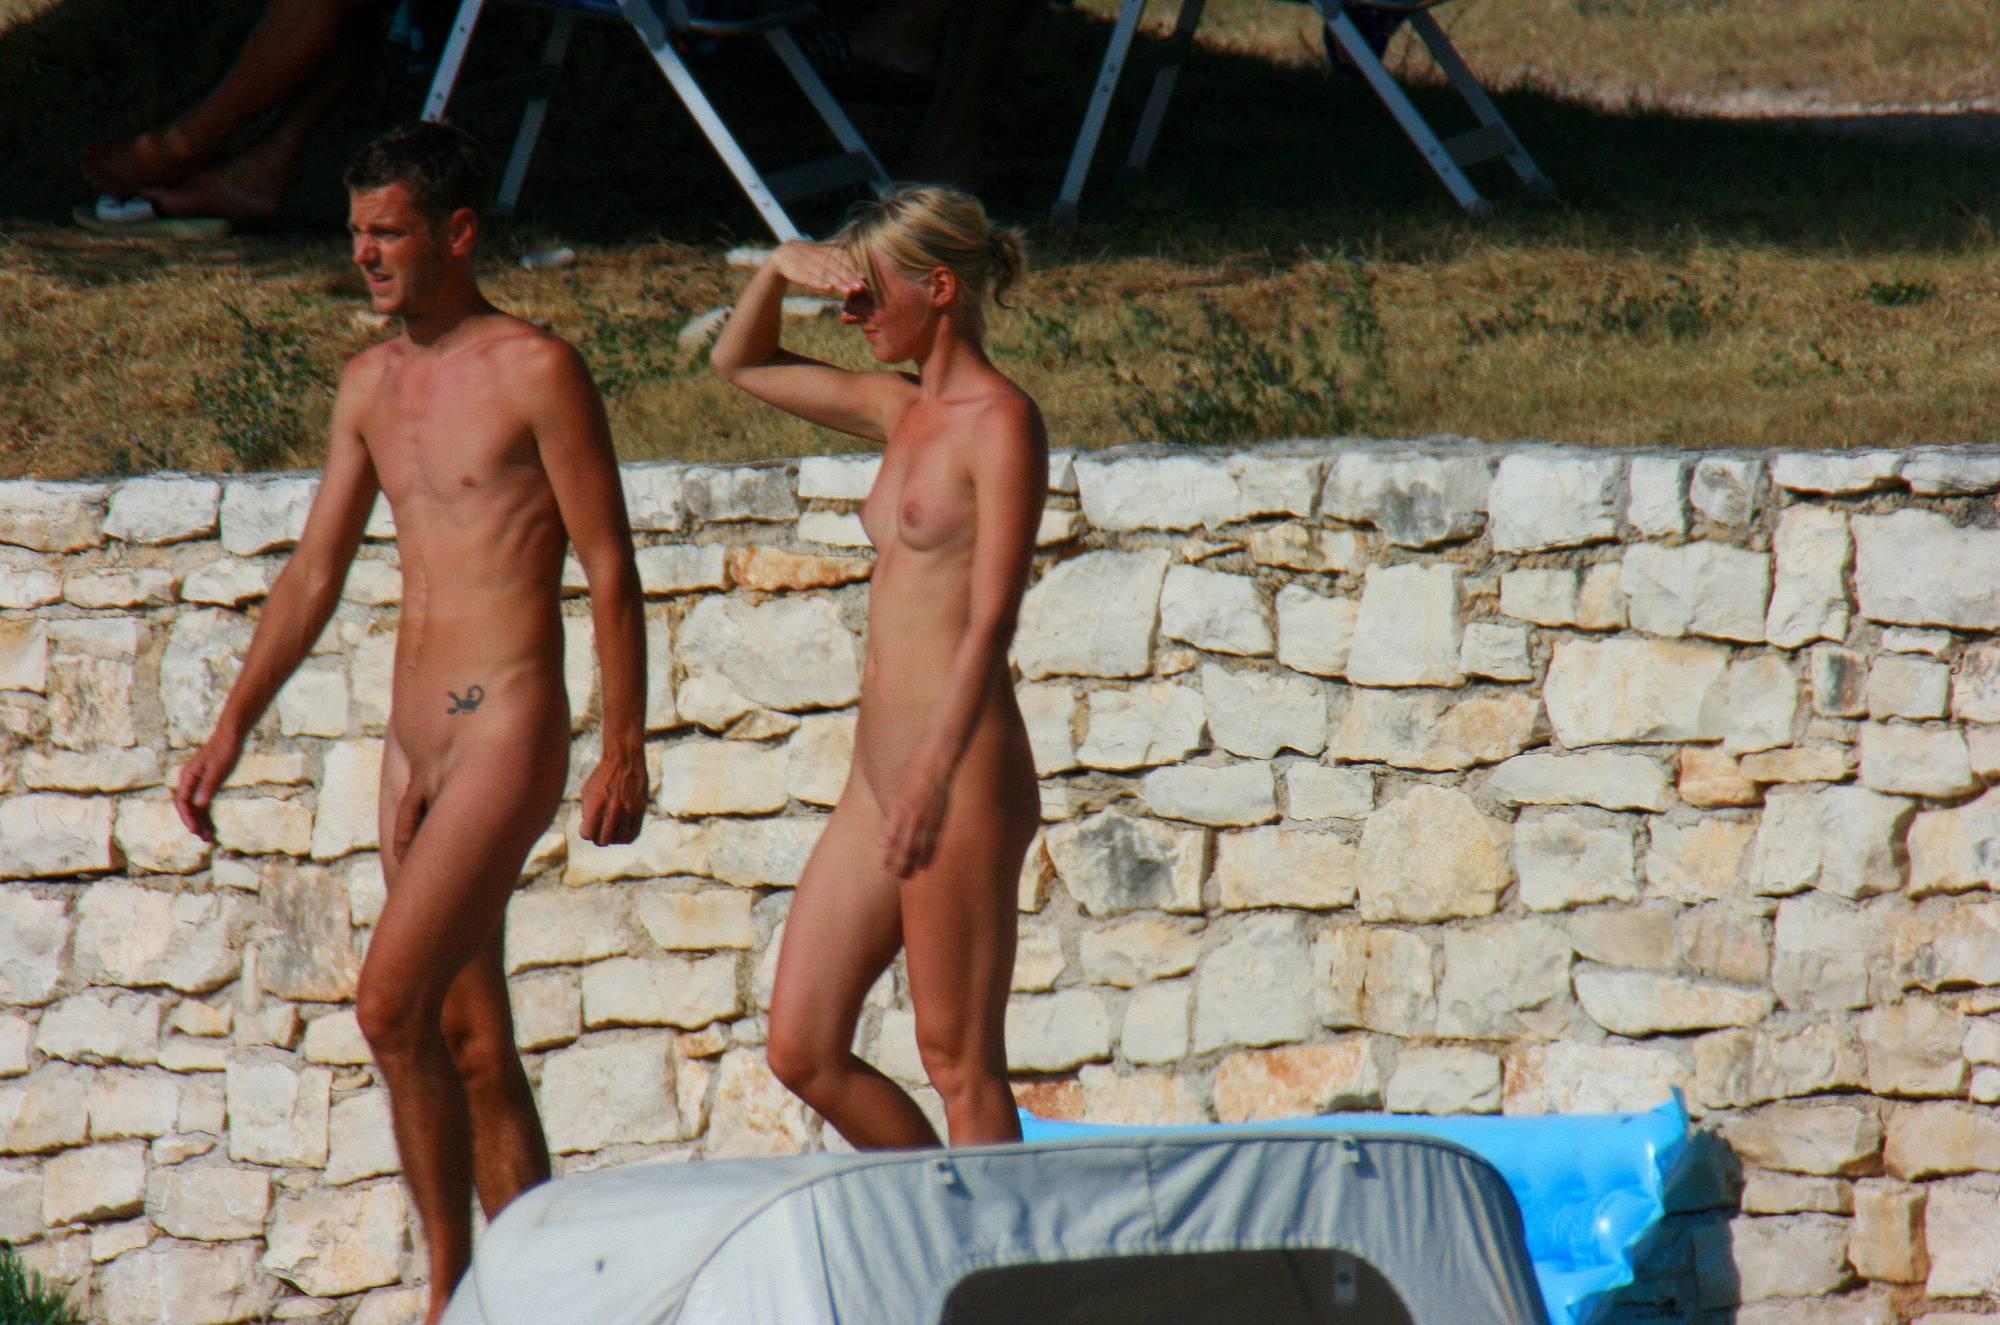 Nudist Pictures Ula FKK Blonde Water Fun - 2